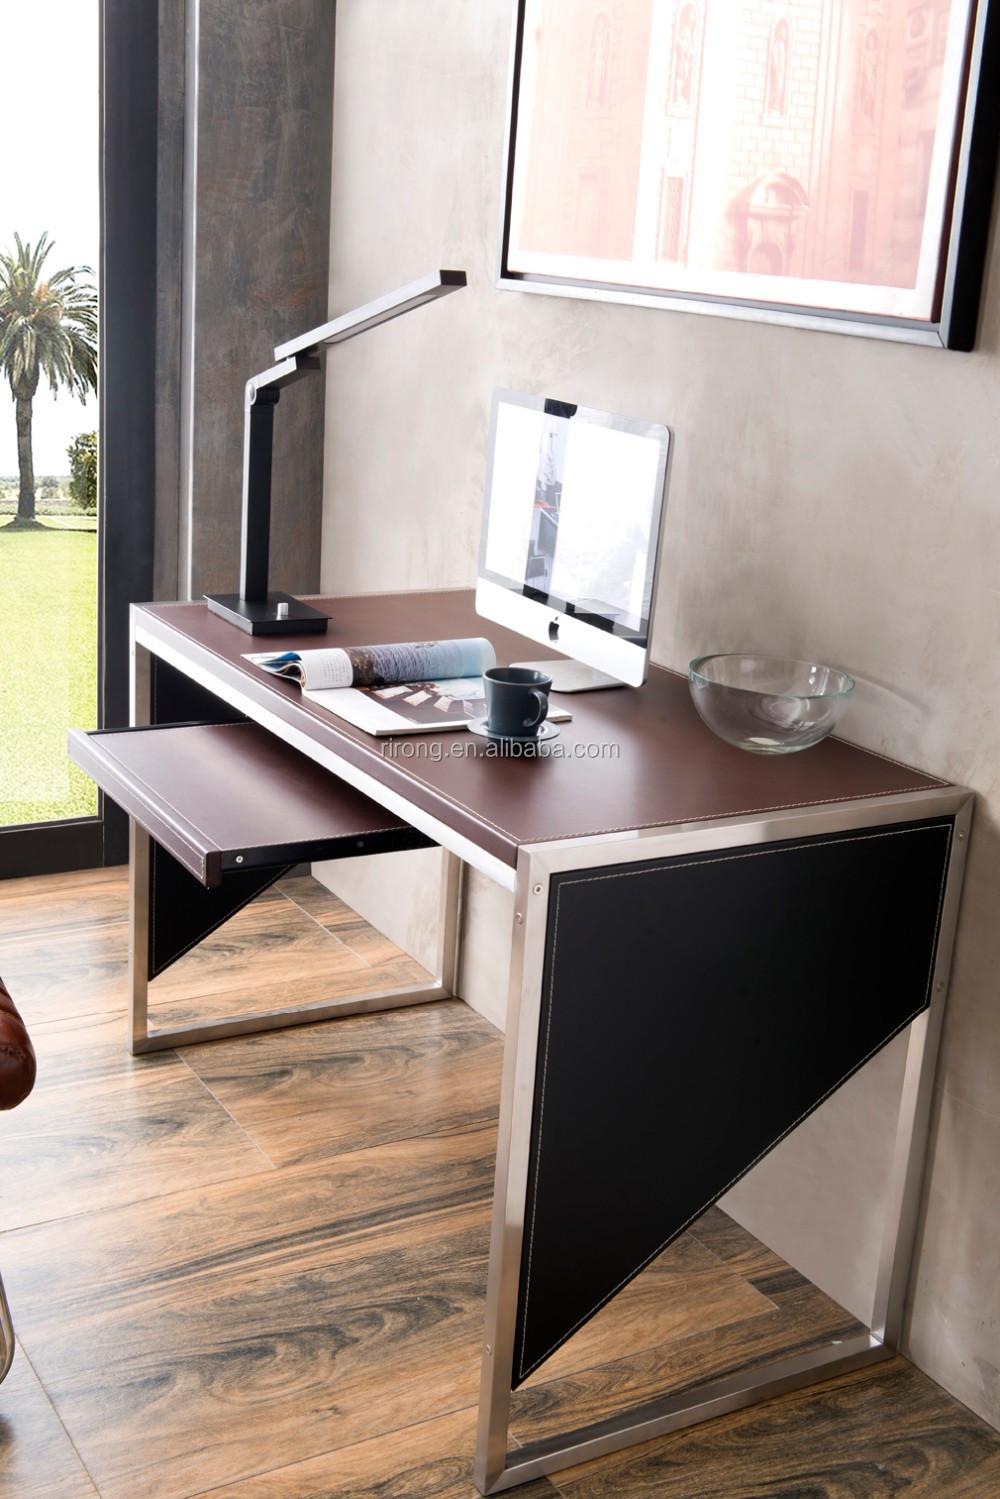 rirong factory direct sale new design cheap modern computer desk buy gaming computer desk new. Black Bedroom Furniture Sets. Home Design Ideas